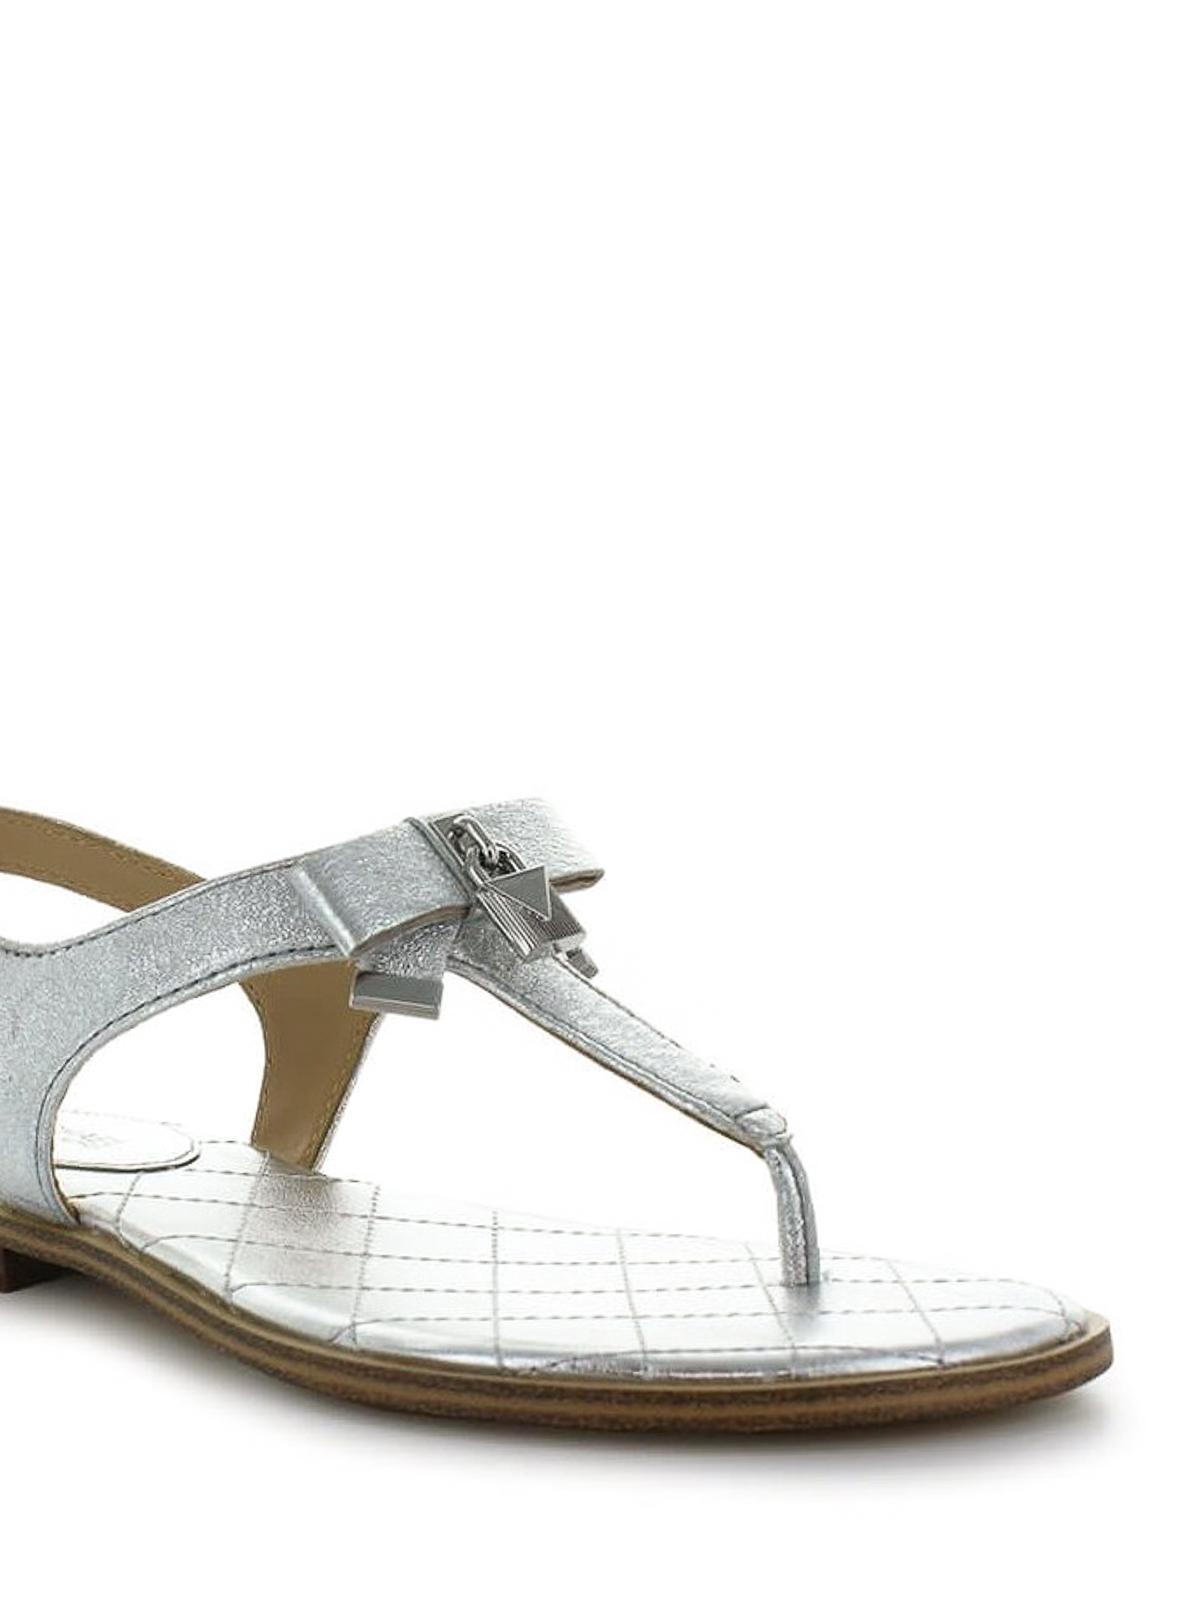 Michael Kors - Alice silver nappa thong